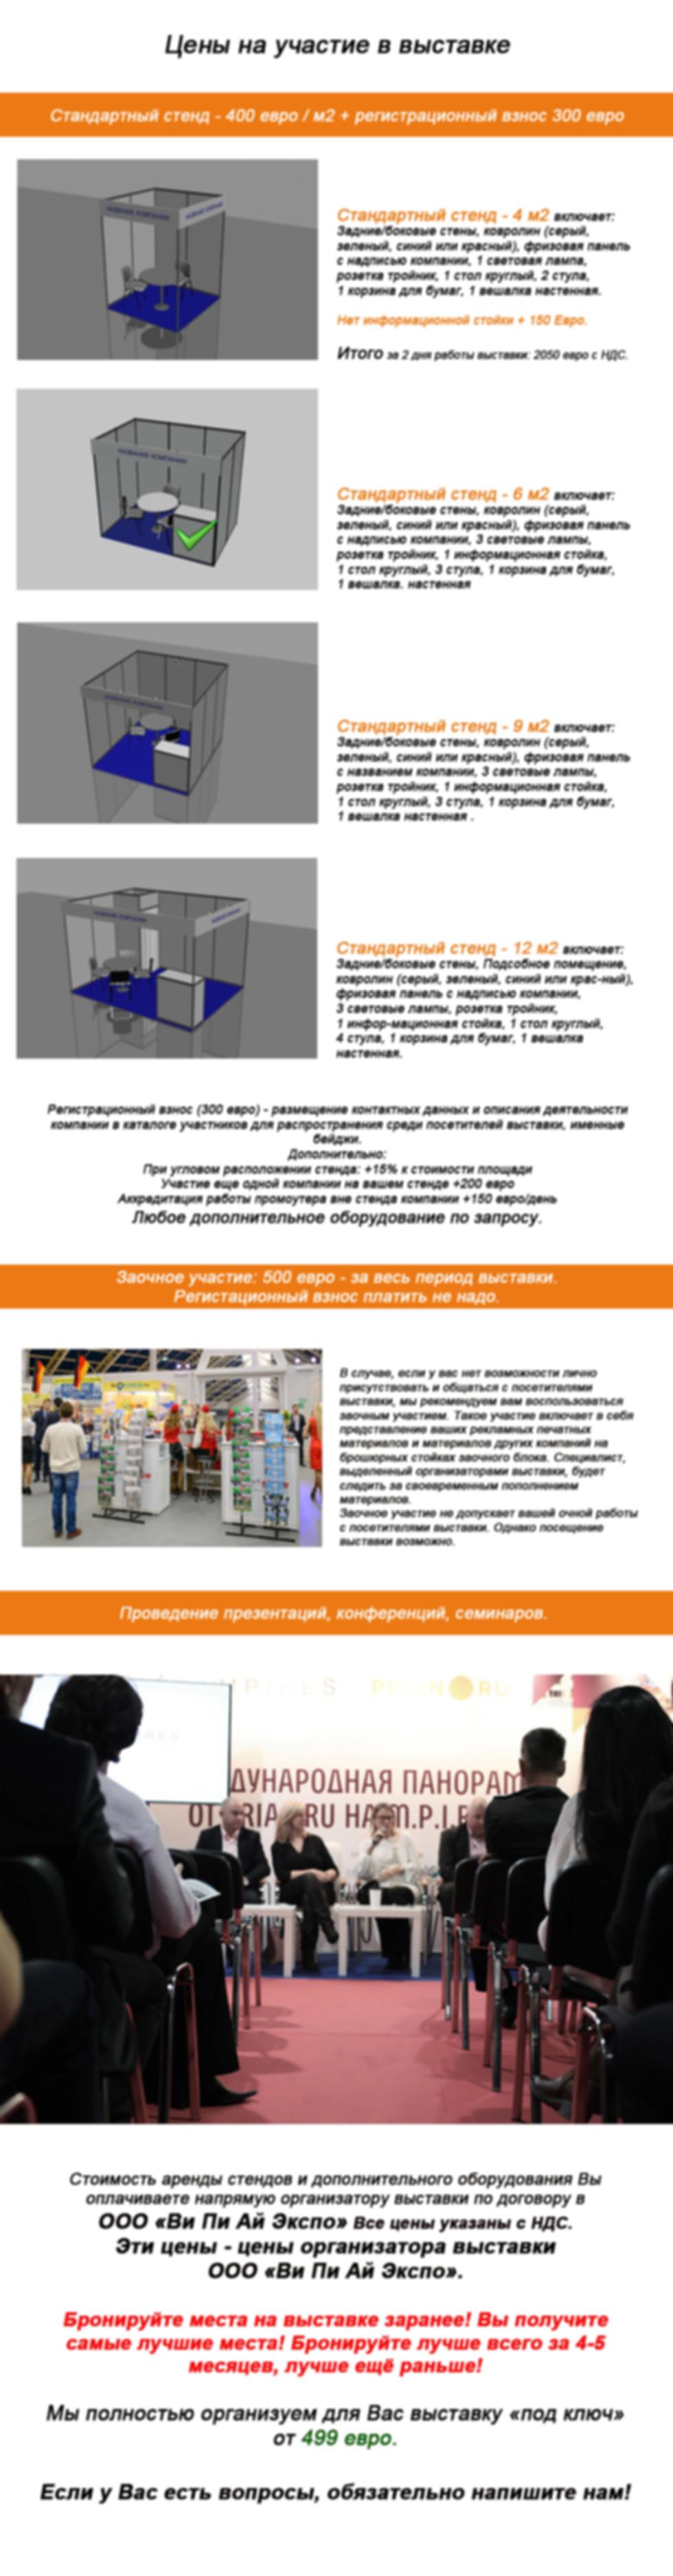 2 Property Show стенды и цены рус.jpg